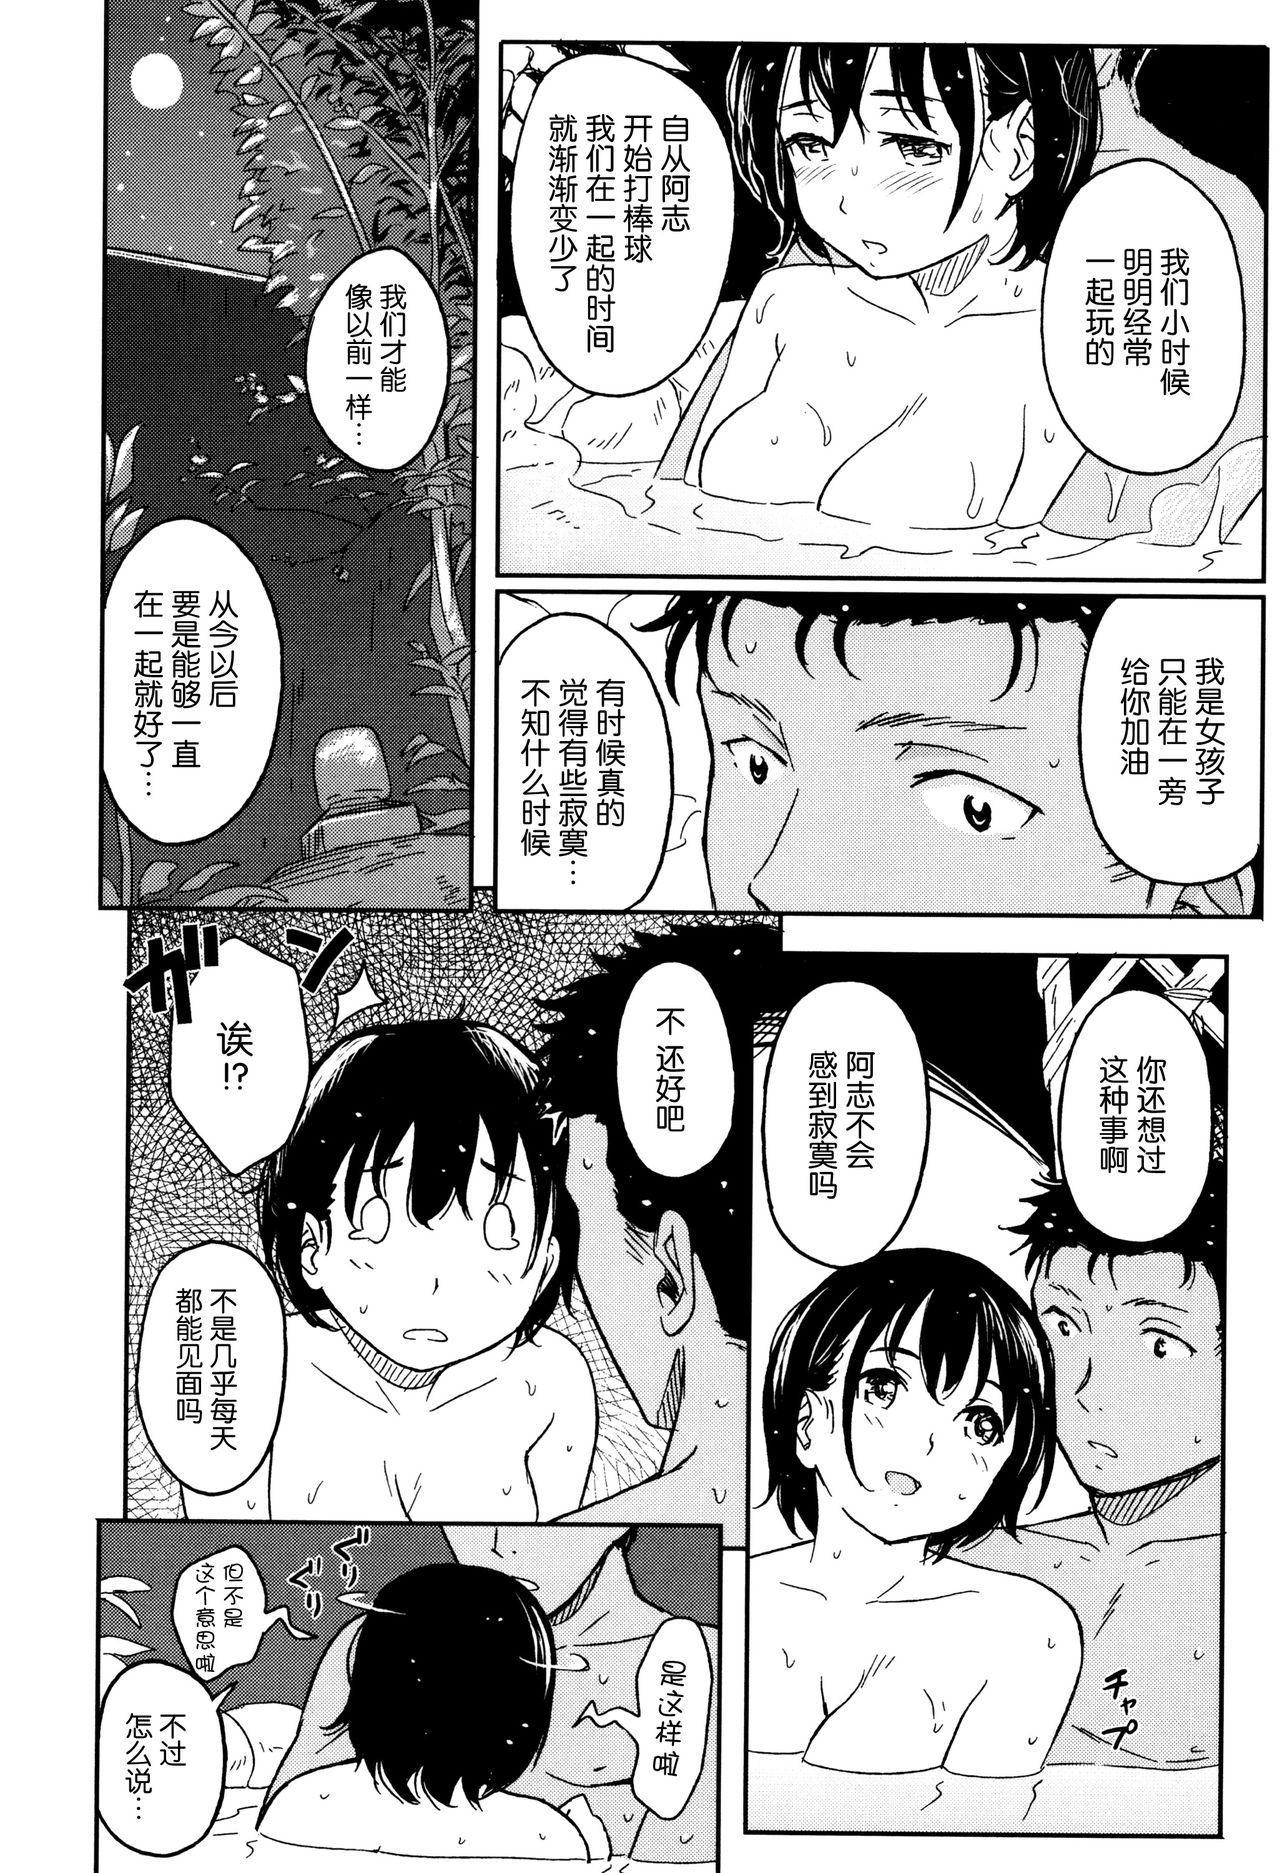 Tokubetsu na Mainichi - Special daily 202